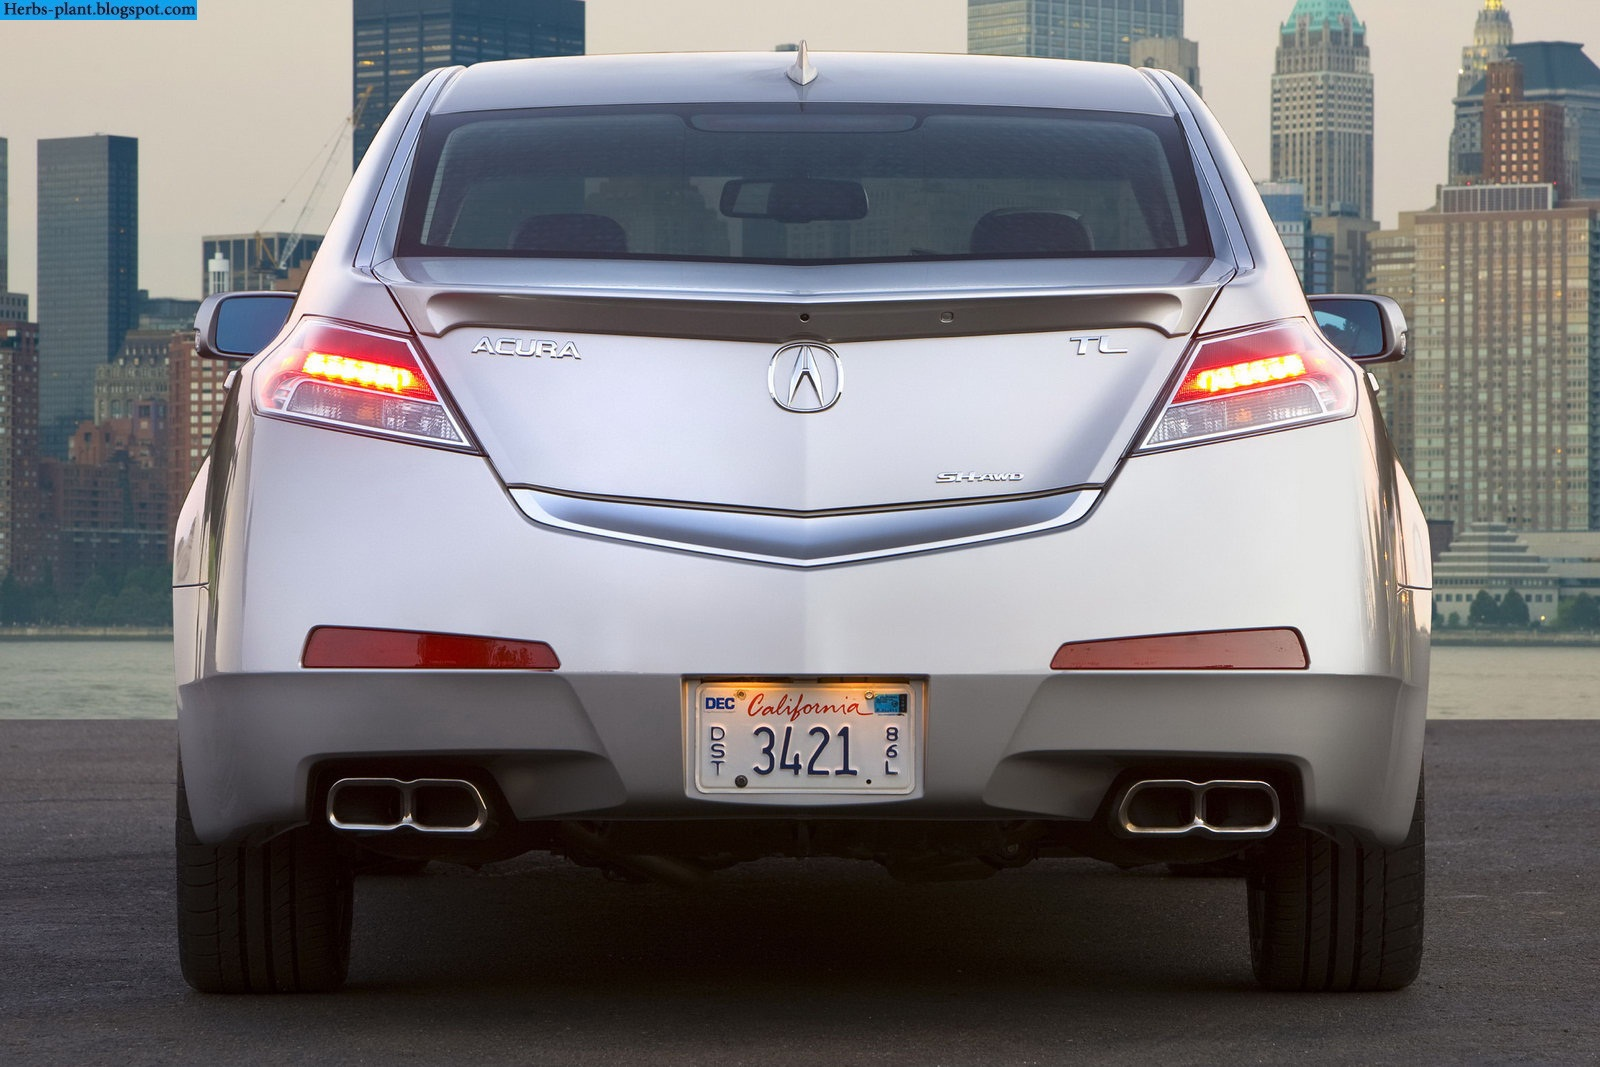 Acura tl car 2013 exhaust - صور شكمان سيارة اكورا تي ال 2013